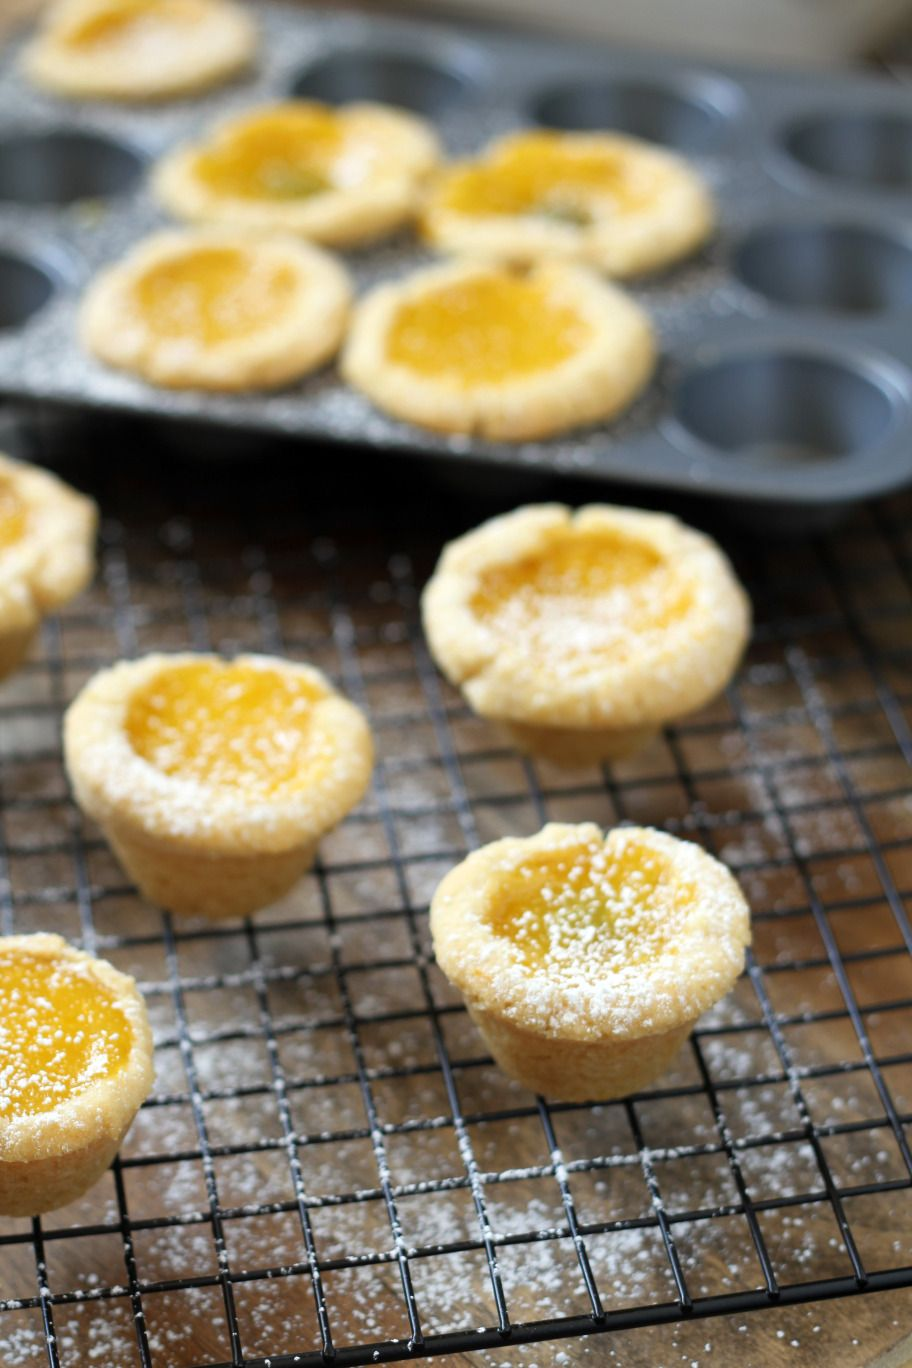 Lemon cup cookies yummy cookies lemon recipes lemon